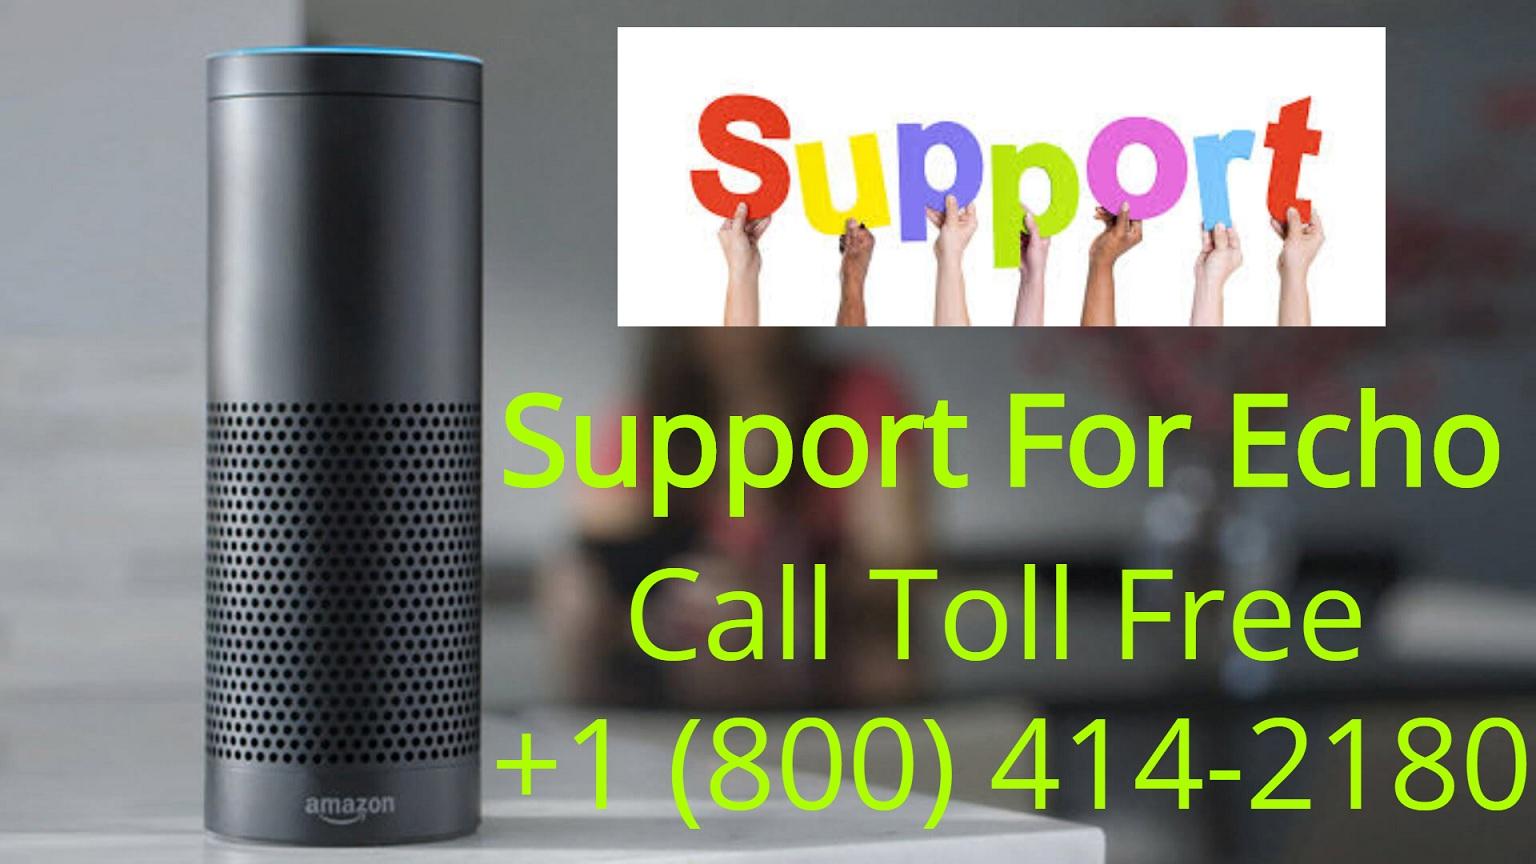 www Amazon com Echosetup Call Toll Free +1 (800) 414-2180 .